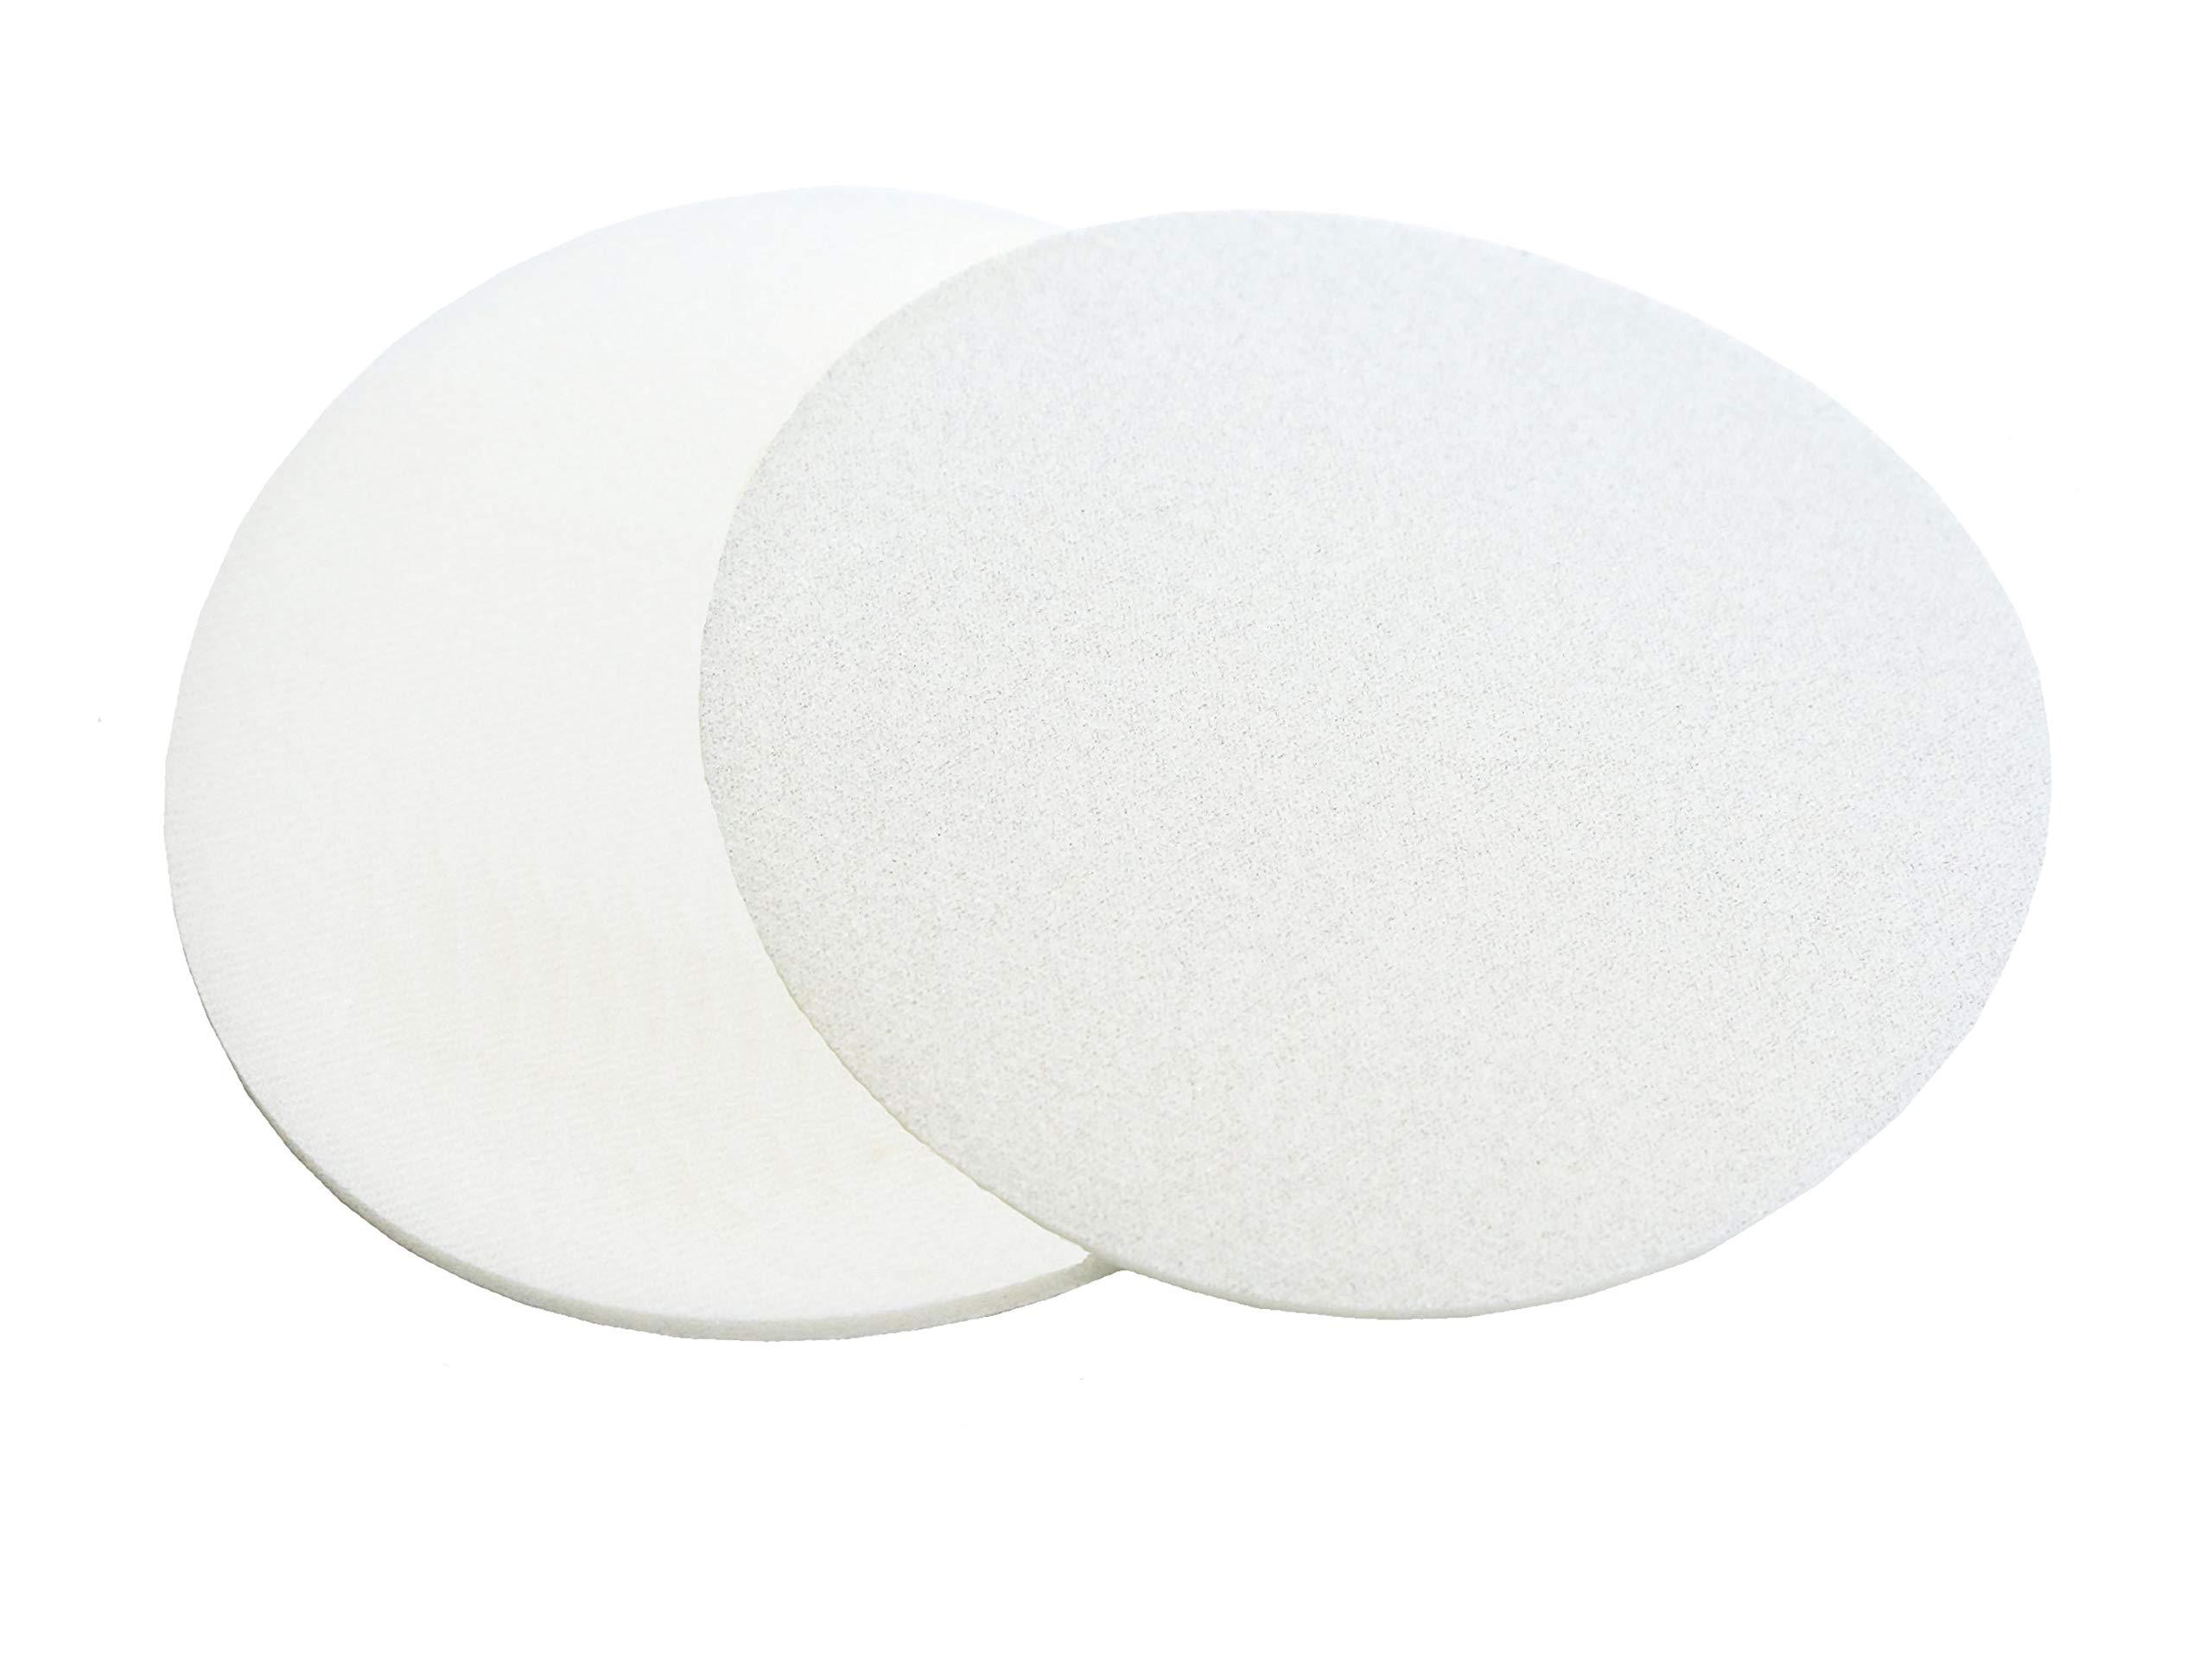 Abrasilk 6 Inch Auto Body Hook and Loop Sanding Discs (500 Grit, 10 Pack)